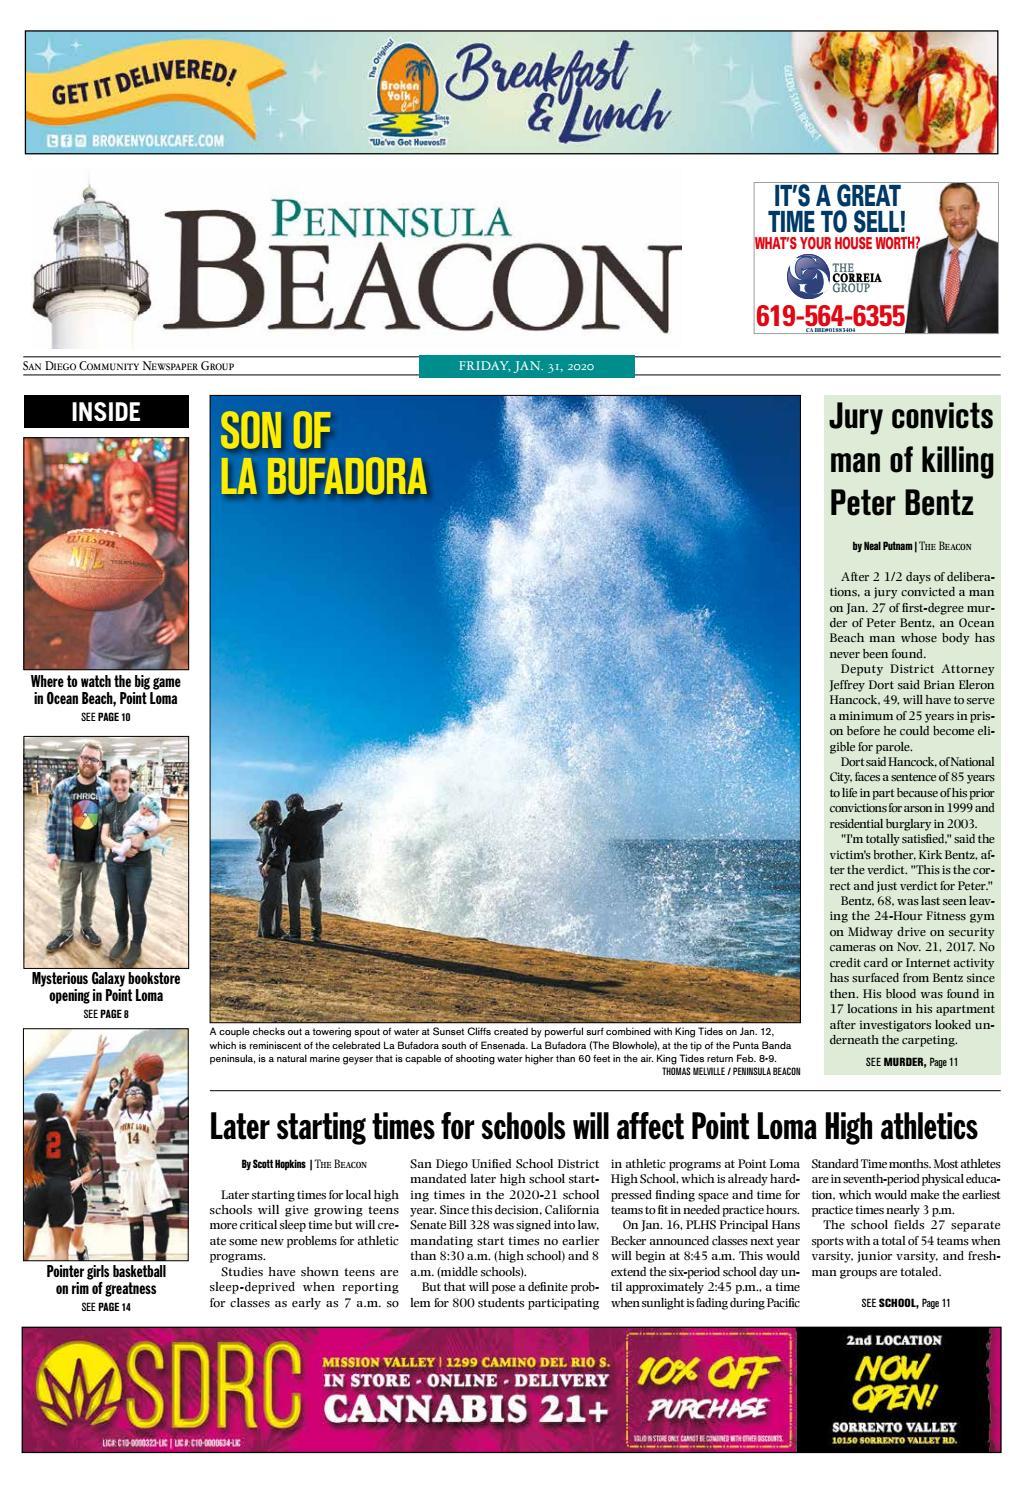 The Peninsula Beacon January 31st 2020 By San Diego Community Newspaper Group Issuu